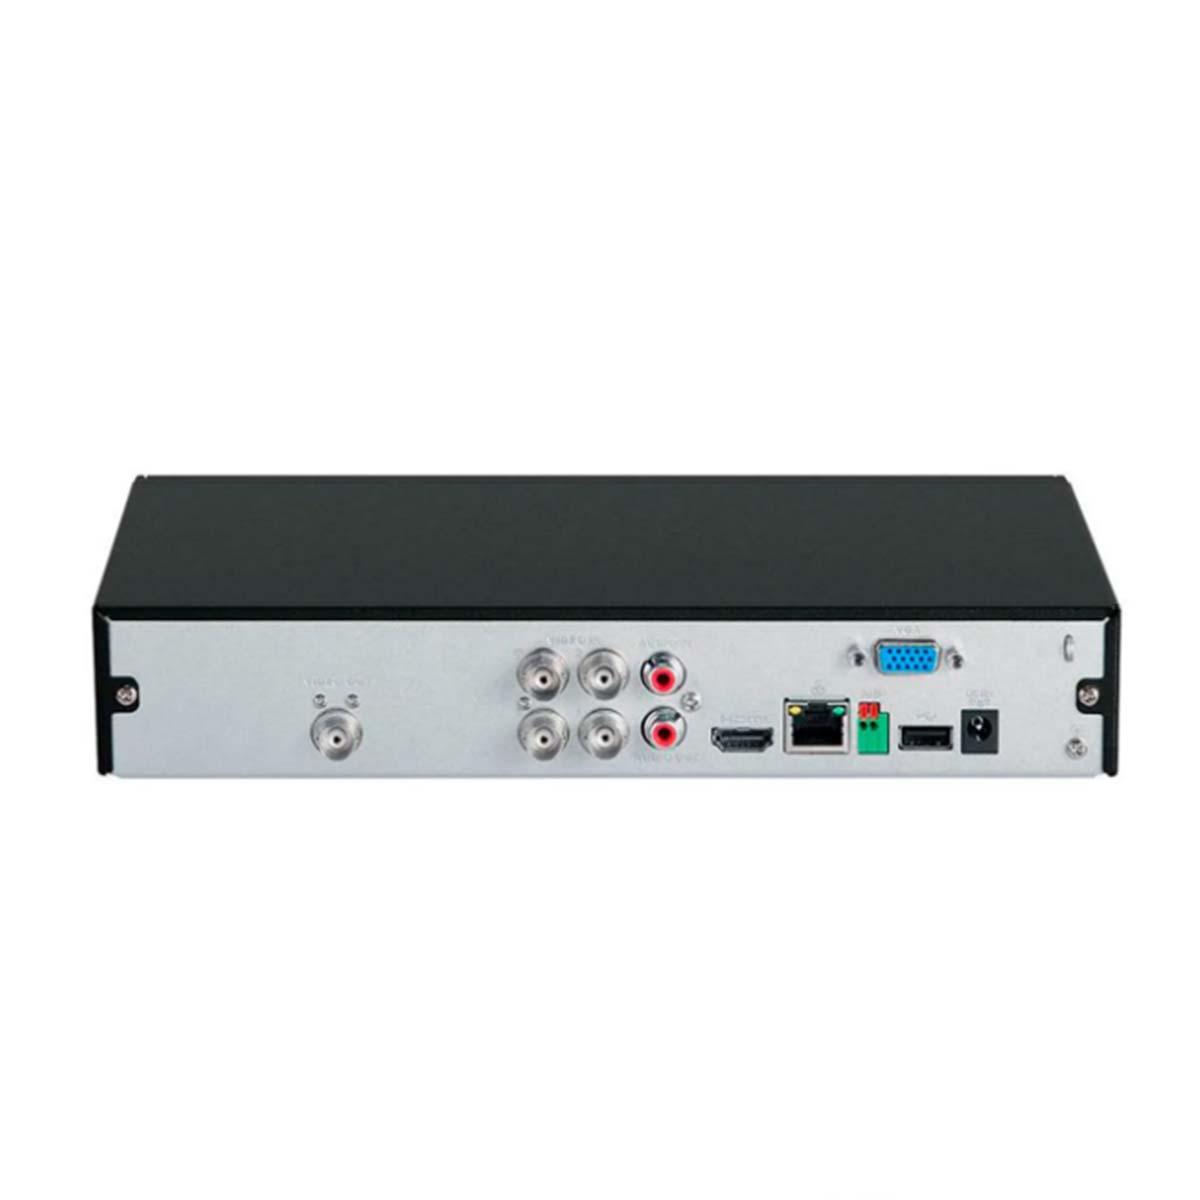 STAND ALONE INTELBRAS DVR 04 CANAIS MHDX 3104 C/ HD 2TB